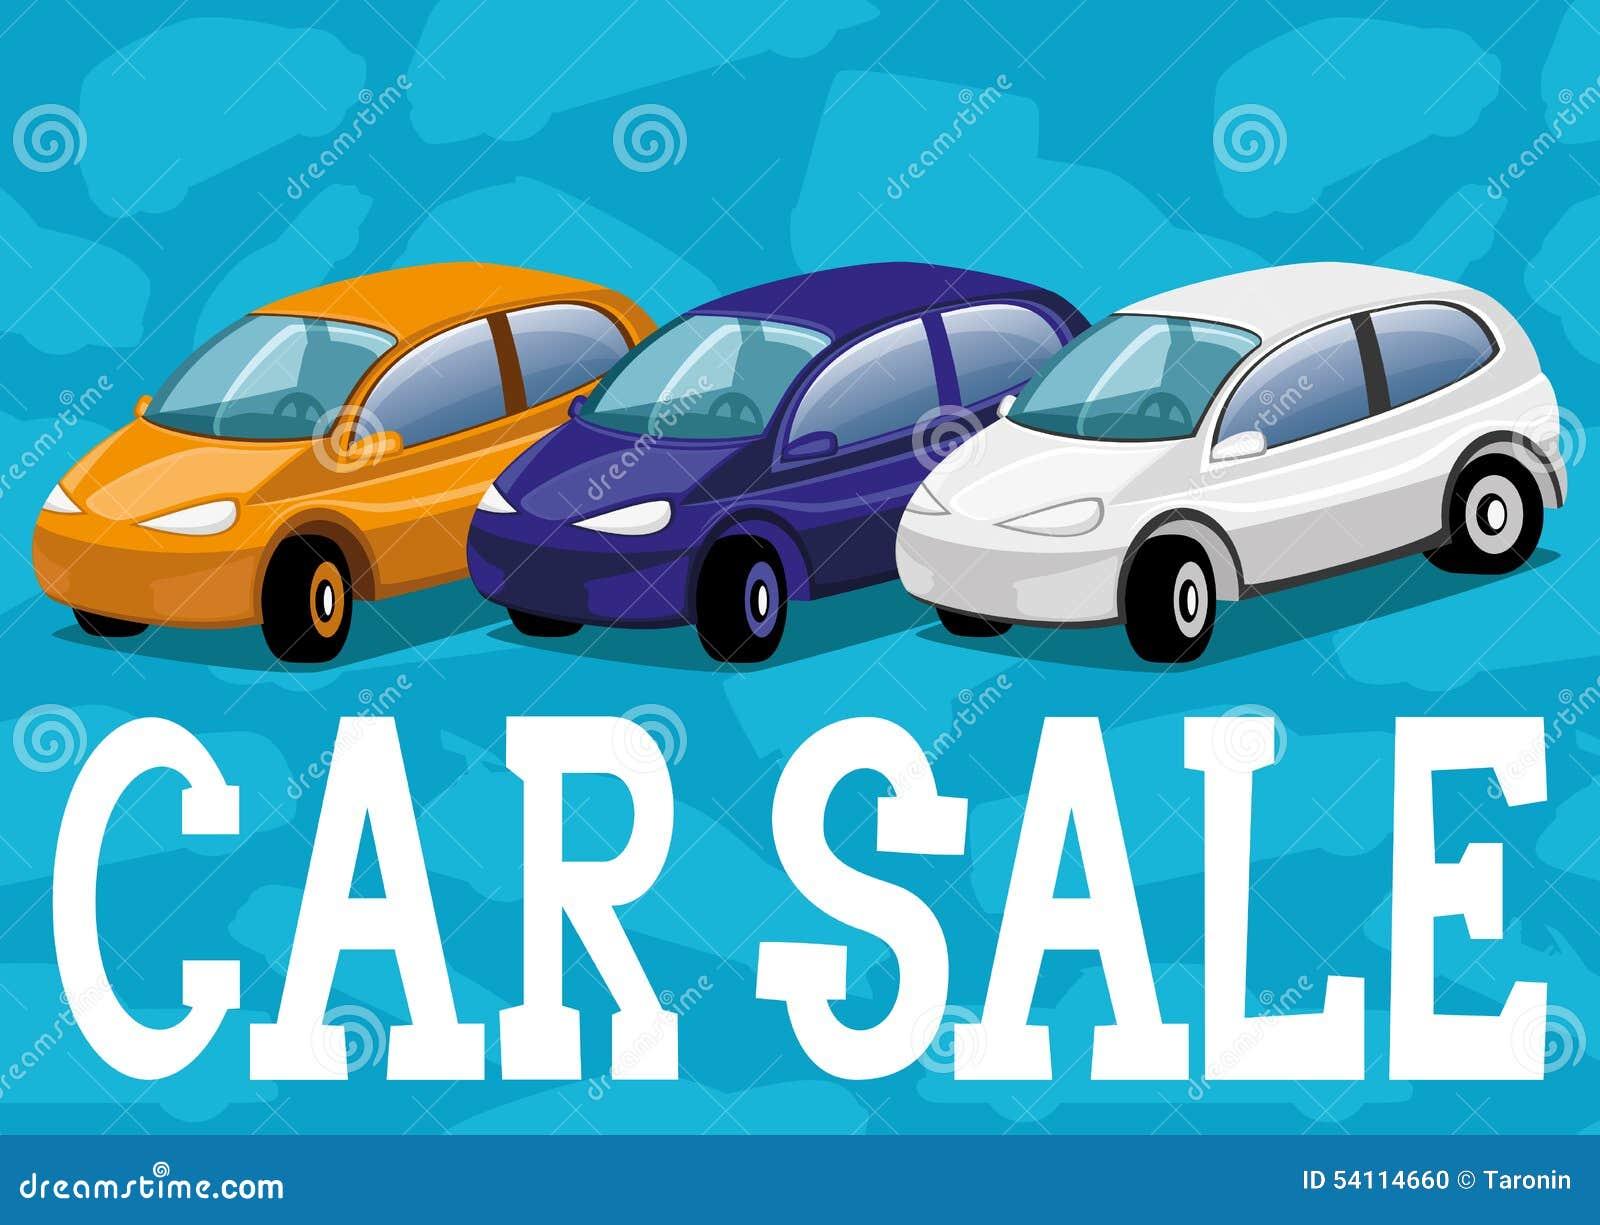 Vector Illustration. Car Sale. Stock Vector - Illustration of design ...